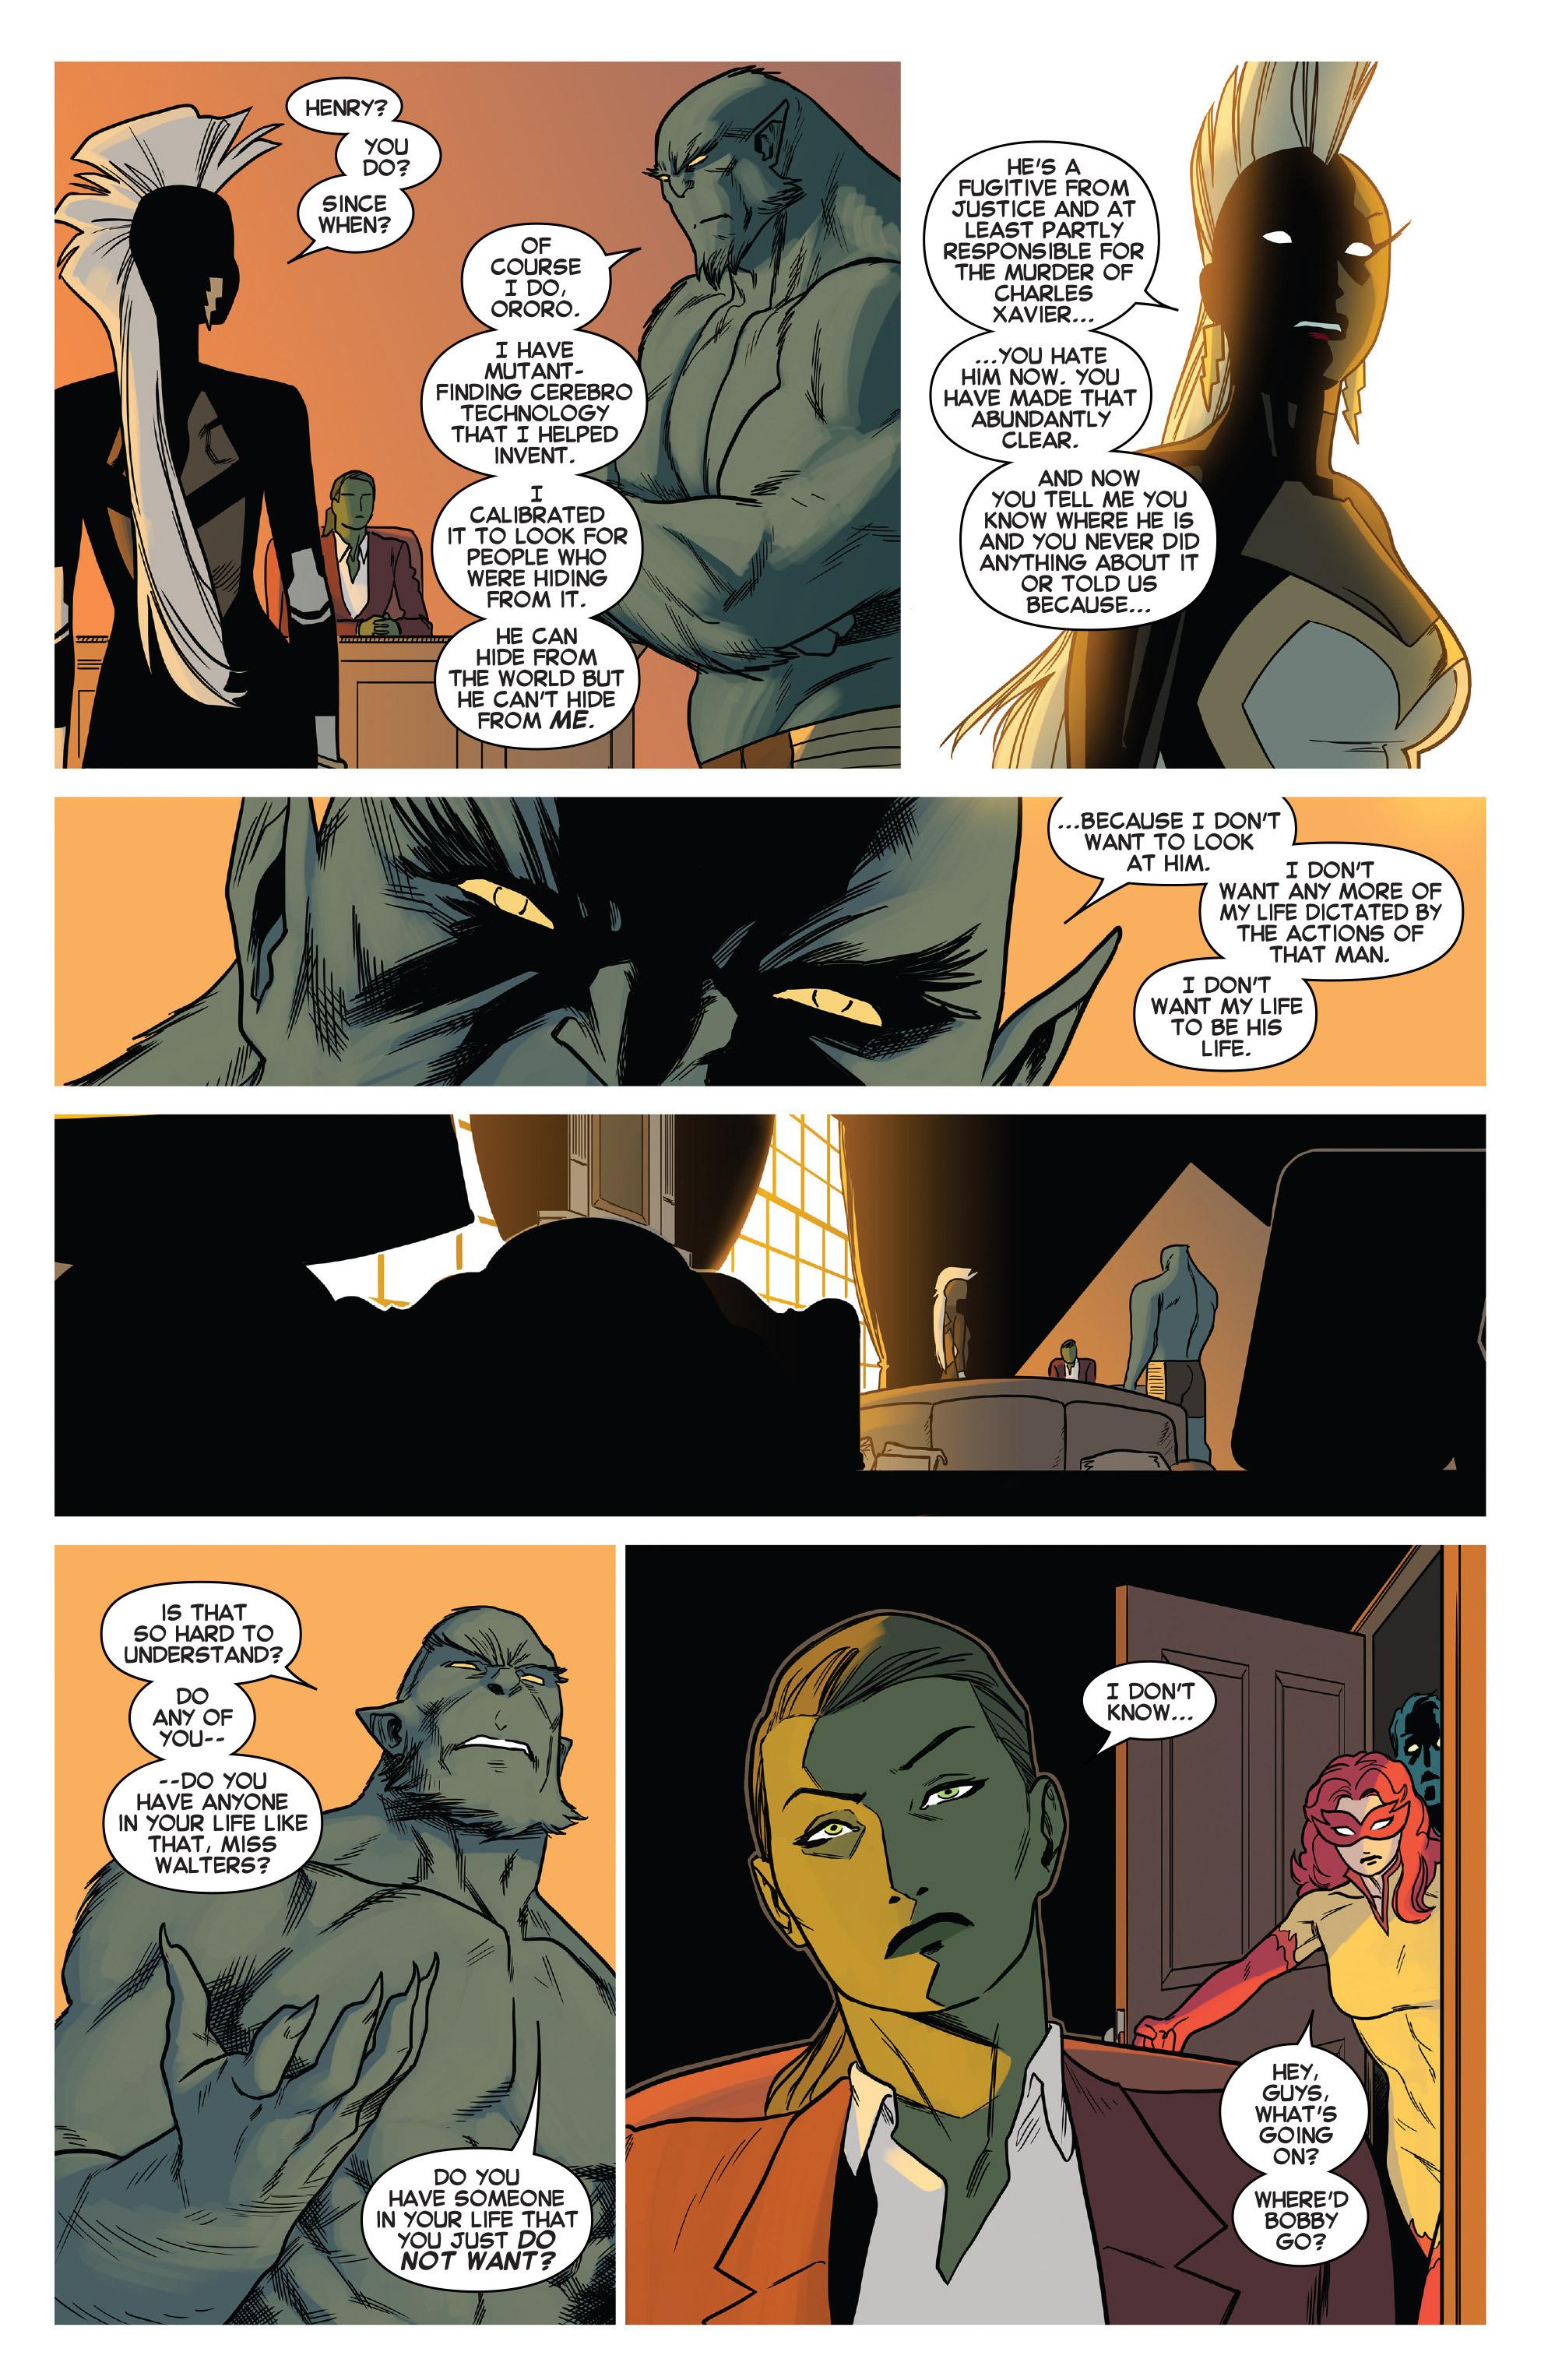 Read online Uncanny X-Men (2013) comic -  Issue # _TPB 4 - vs. S.H.I.E.L.D - 103